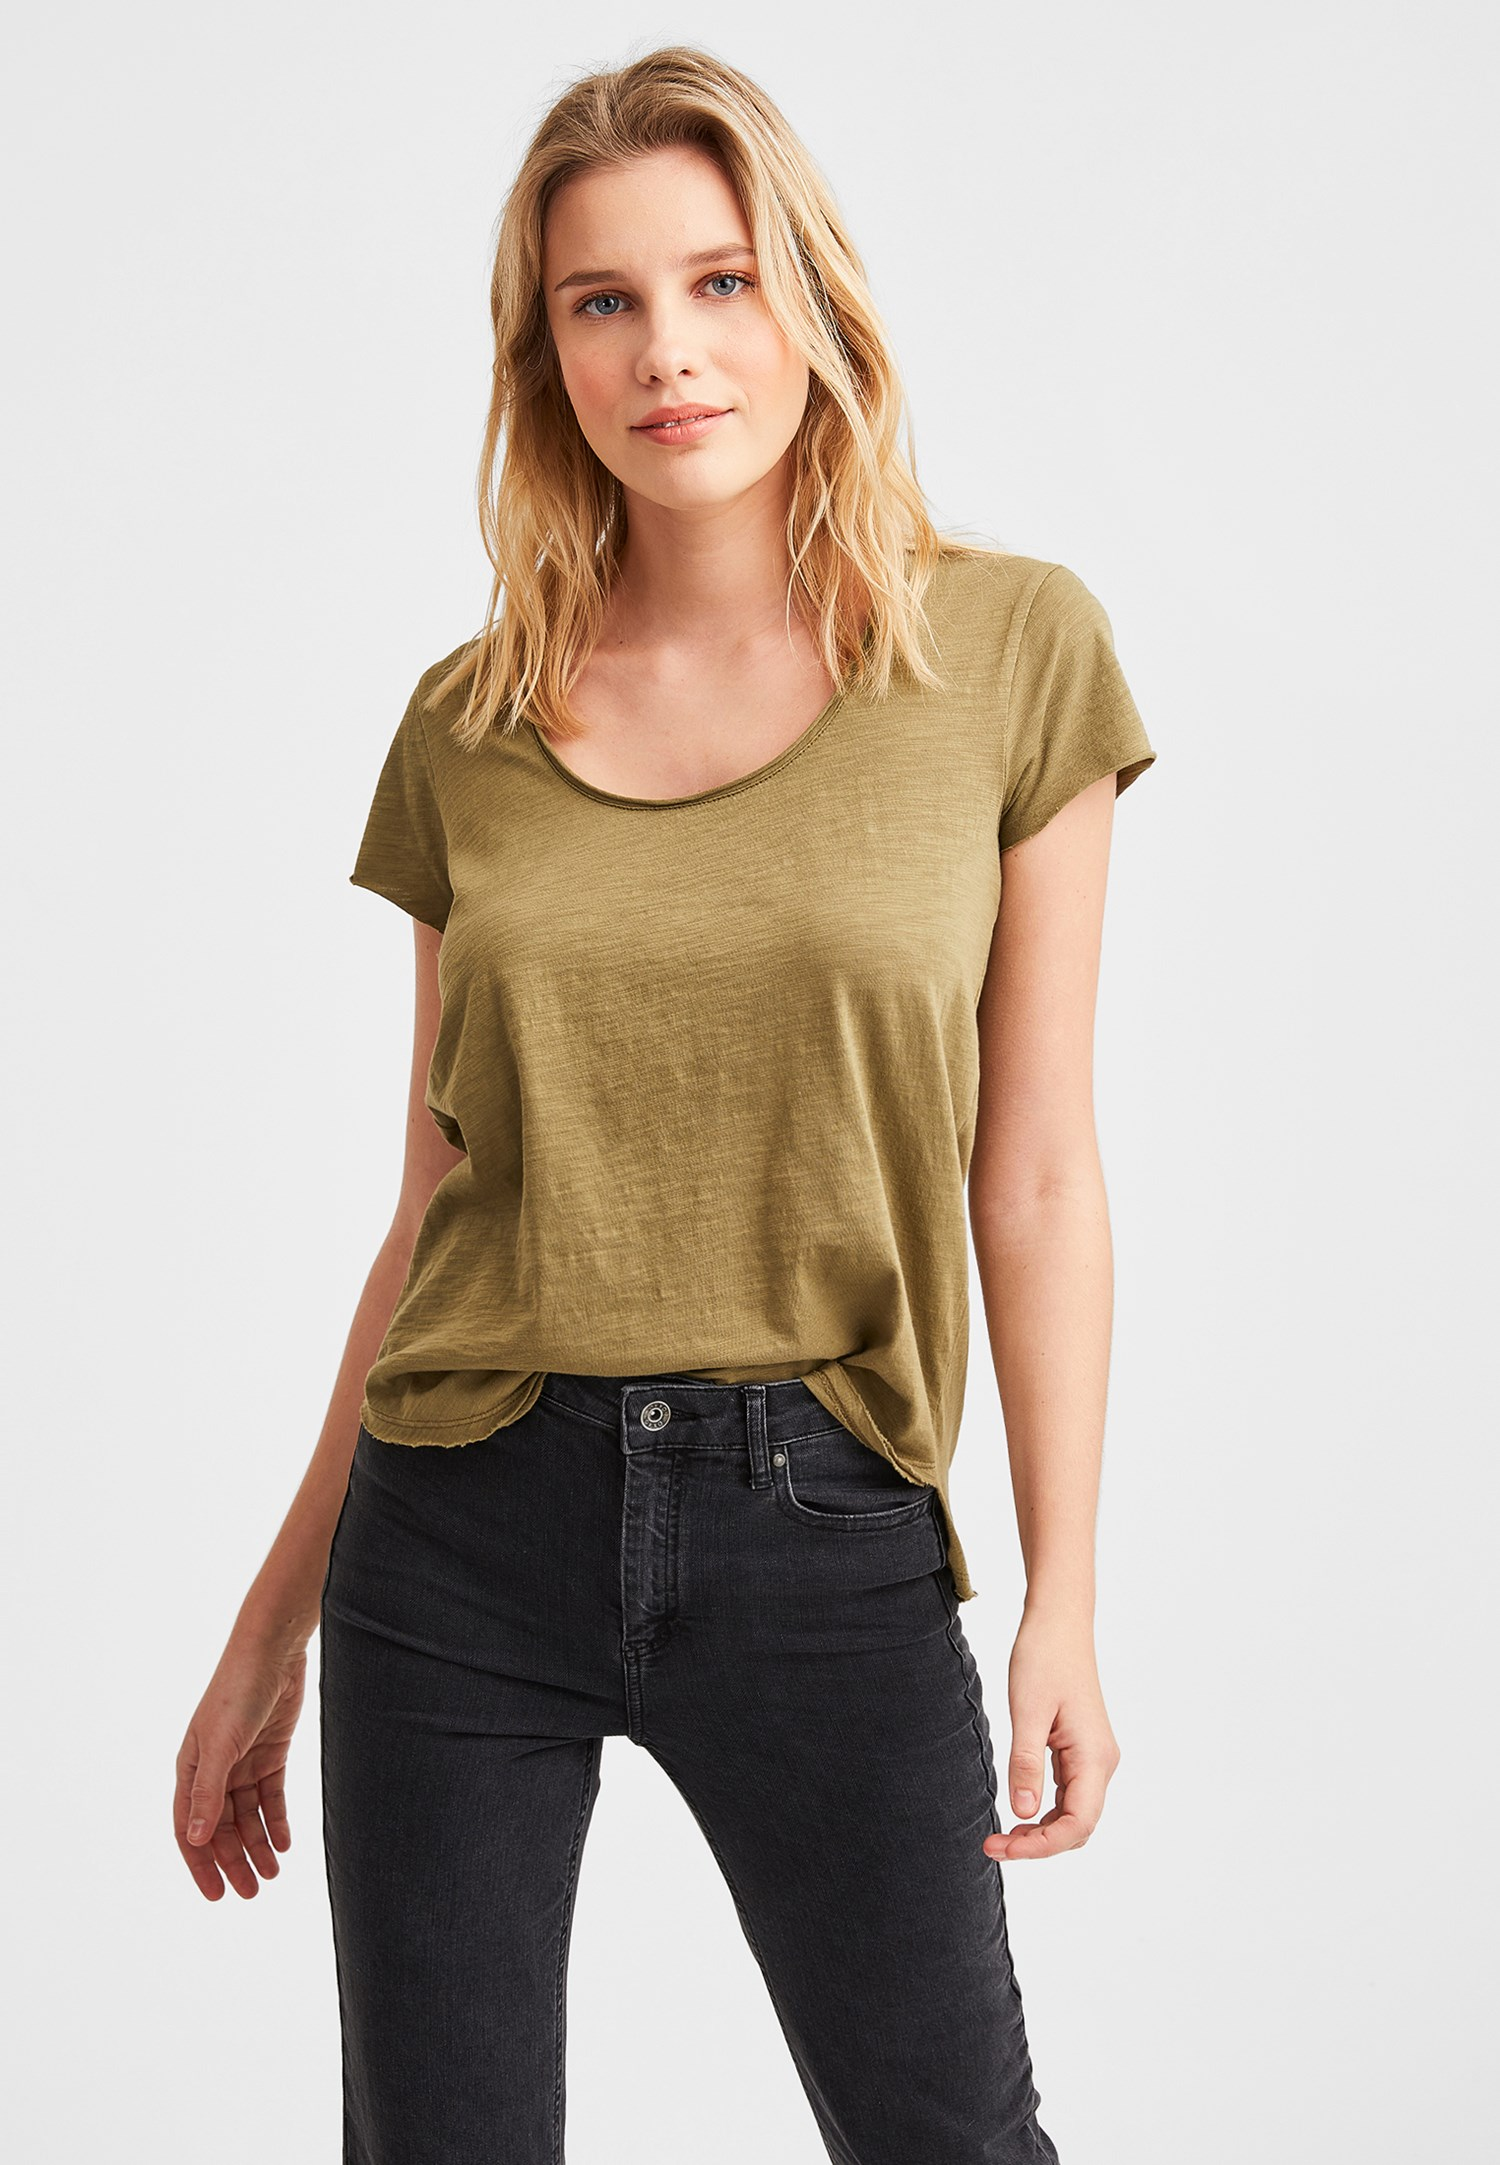 Bayan Yeşil Kısa Kollu U Yaka Tişört